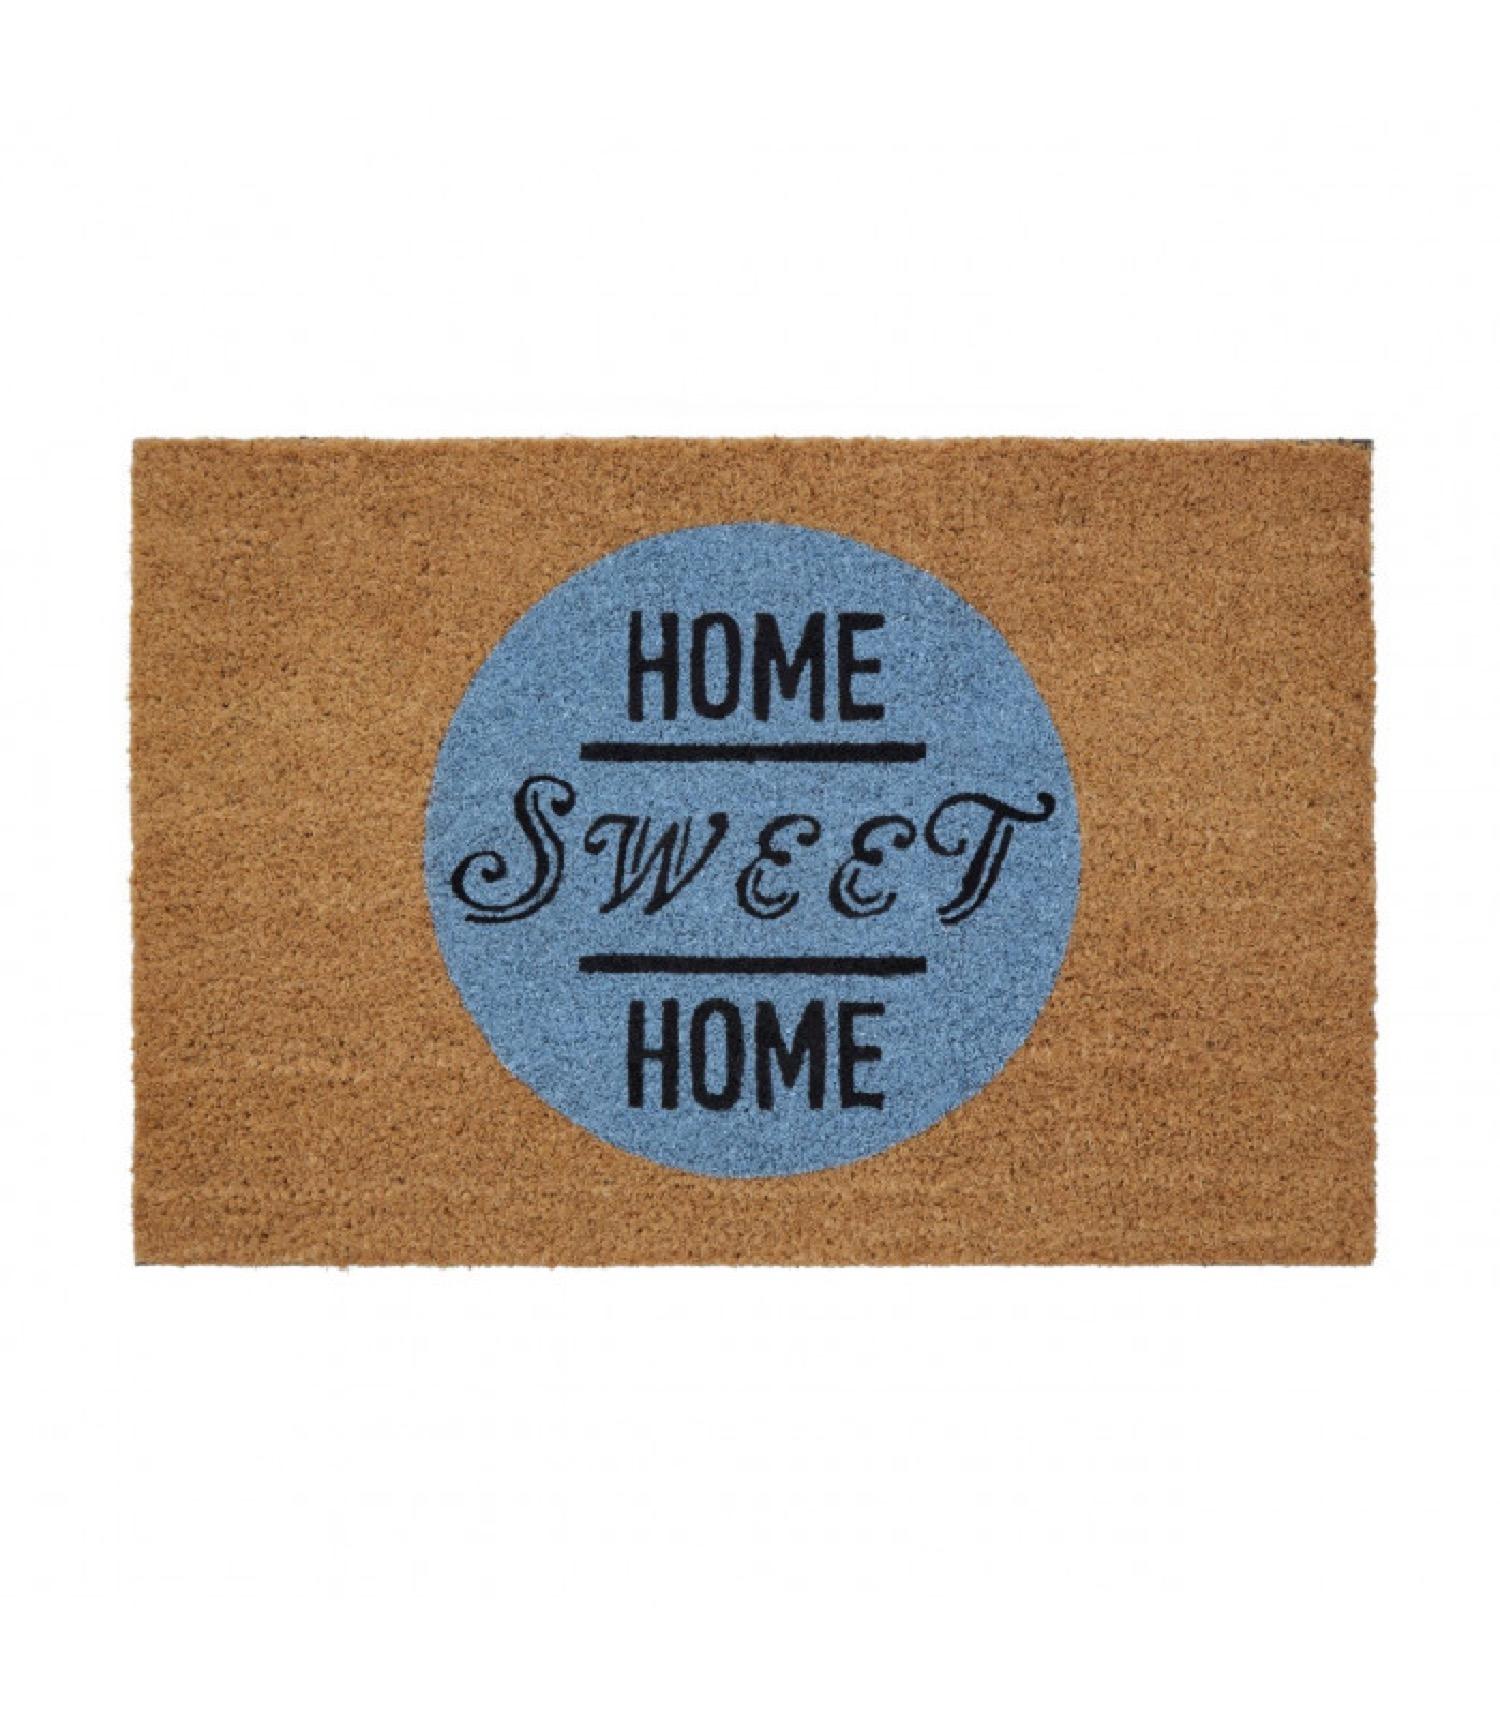 Paillasson coco home sweet home 60x40cm